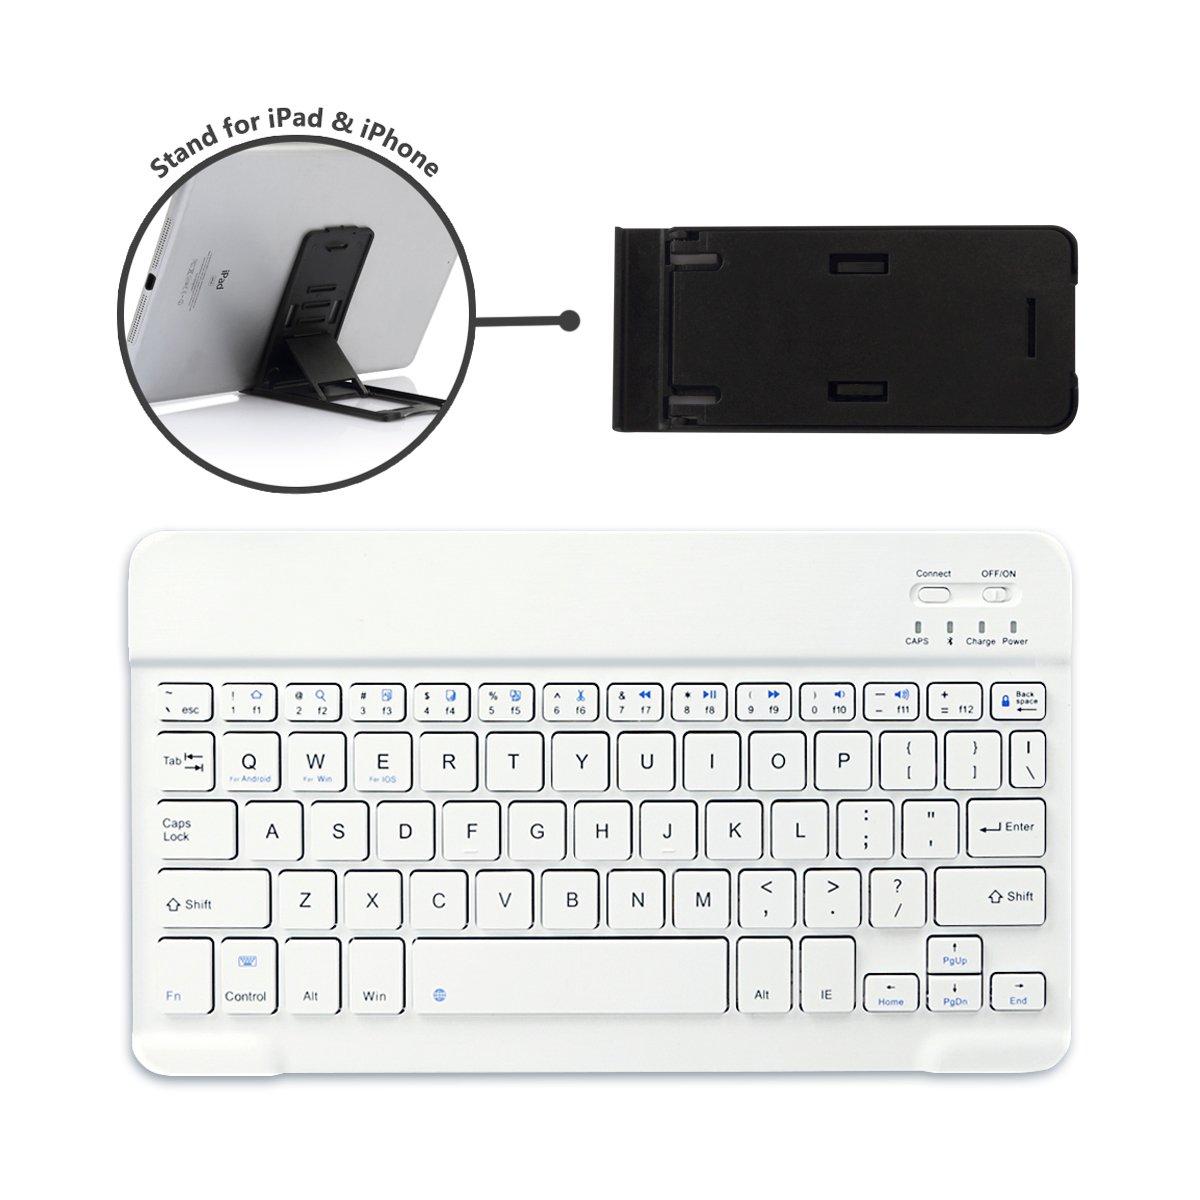 CoastaCloud Portable 10-inch Ultra Slim ABS Wireless Bluetooth Keyboard for iPad 10.5, iPad 9.7'', iPad Pro, iPad Air, iPad 2/3/4, Galaxy Tab Note and Any iOS, Android, Windows Tablets (White) by CoastaCloud (Image #1)